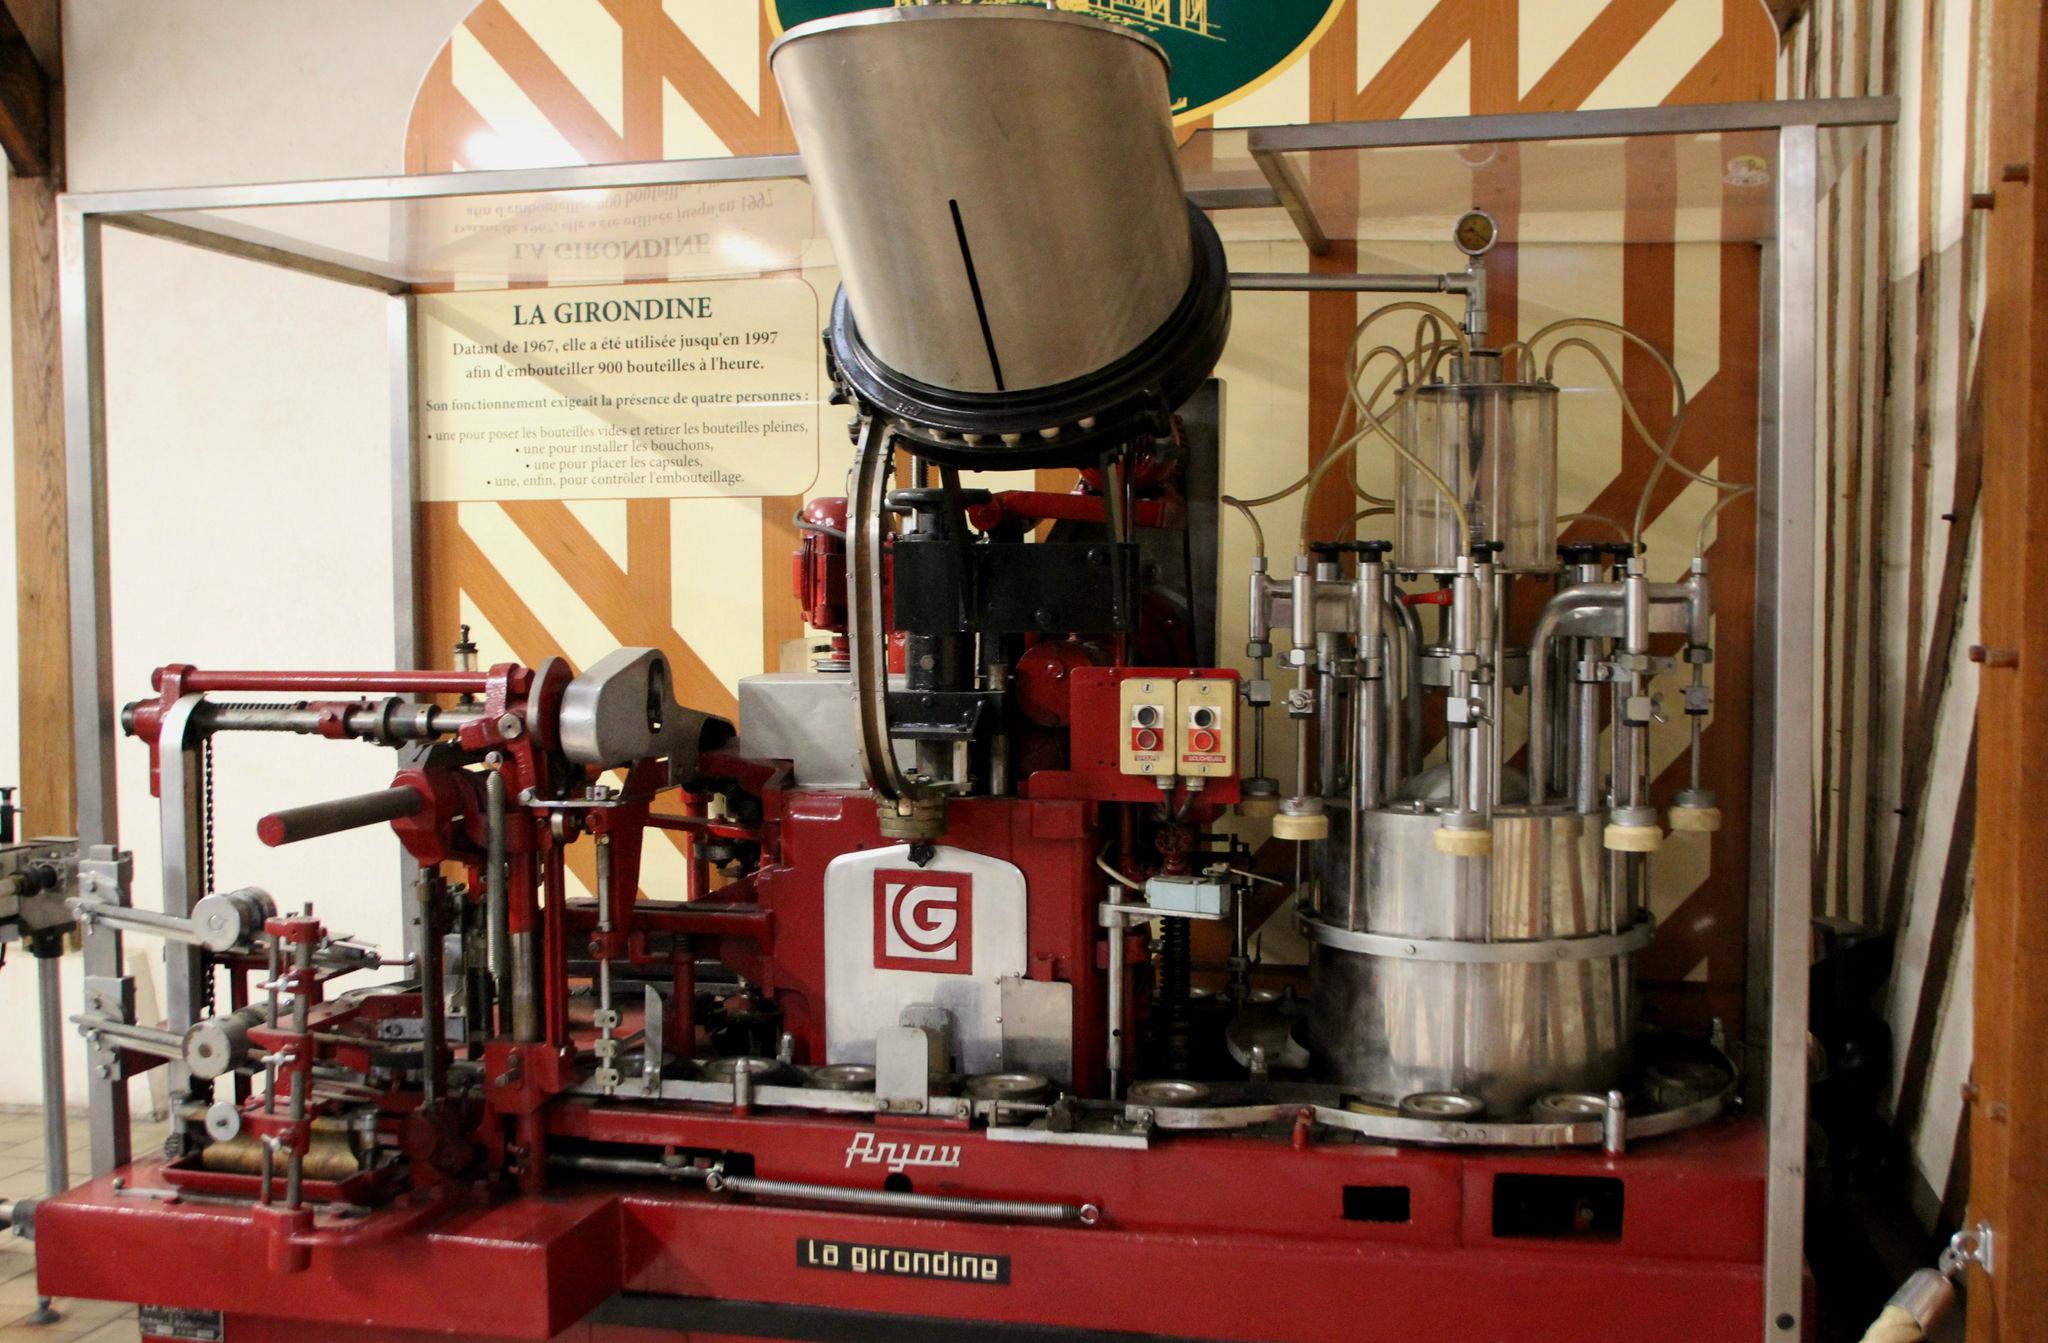 Normandia cosa vedere - distilleria del Calvados Busnel @Images de Normandie et d'ailleurs via Flickr